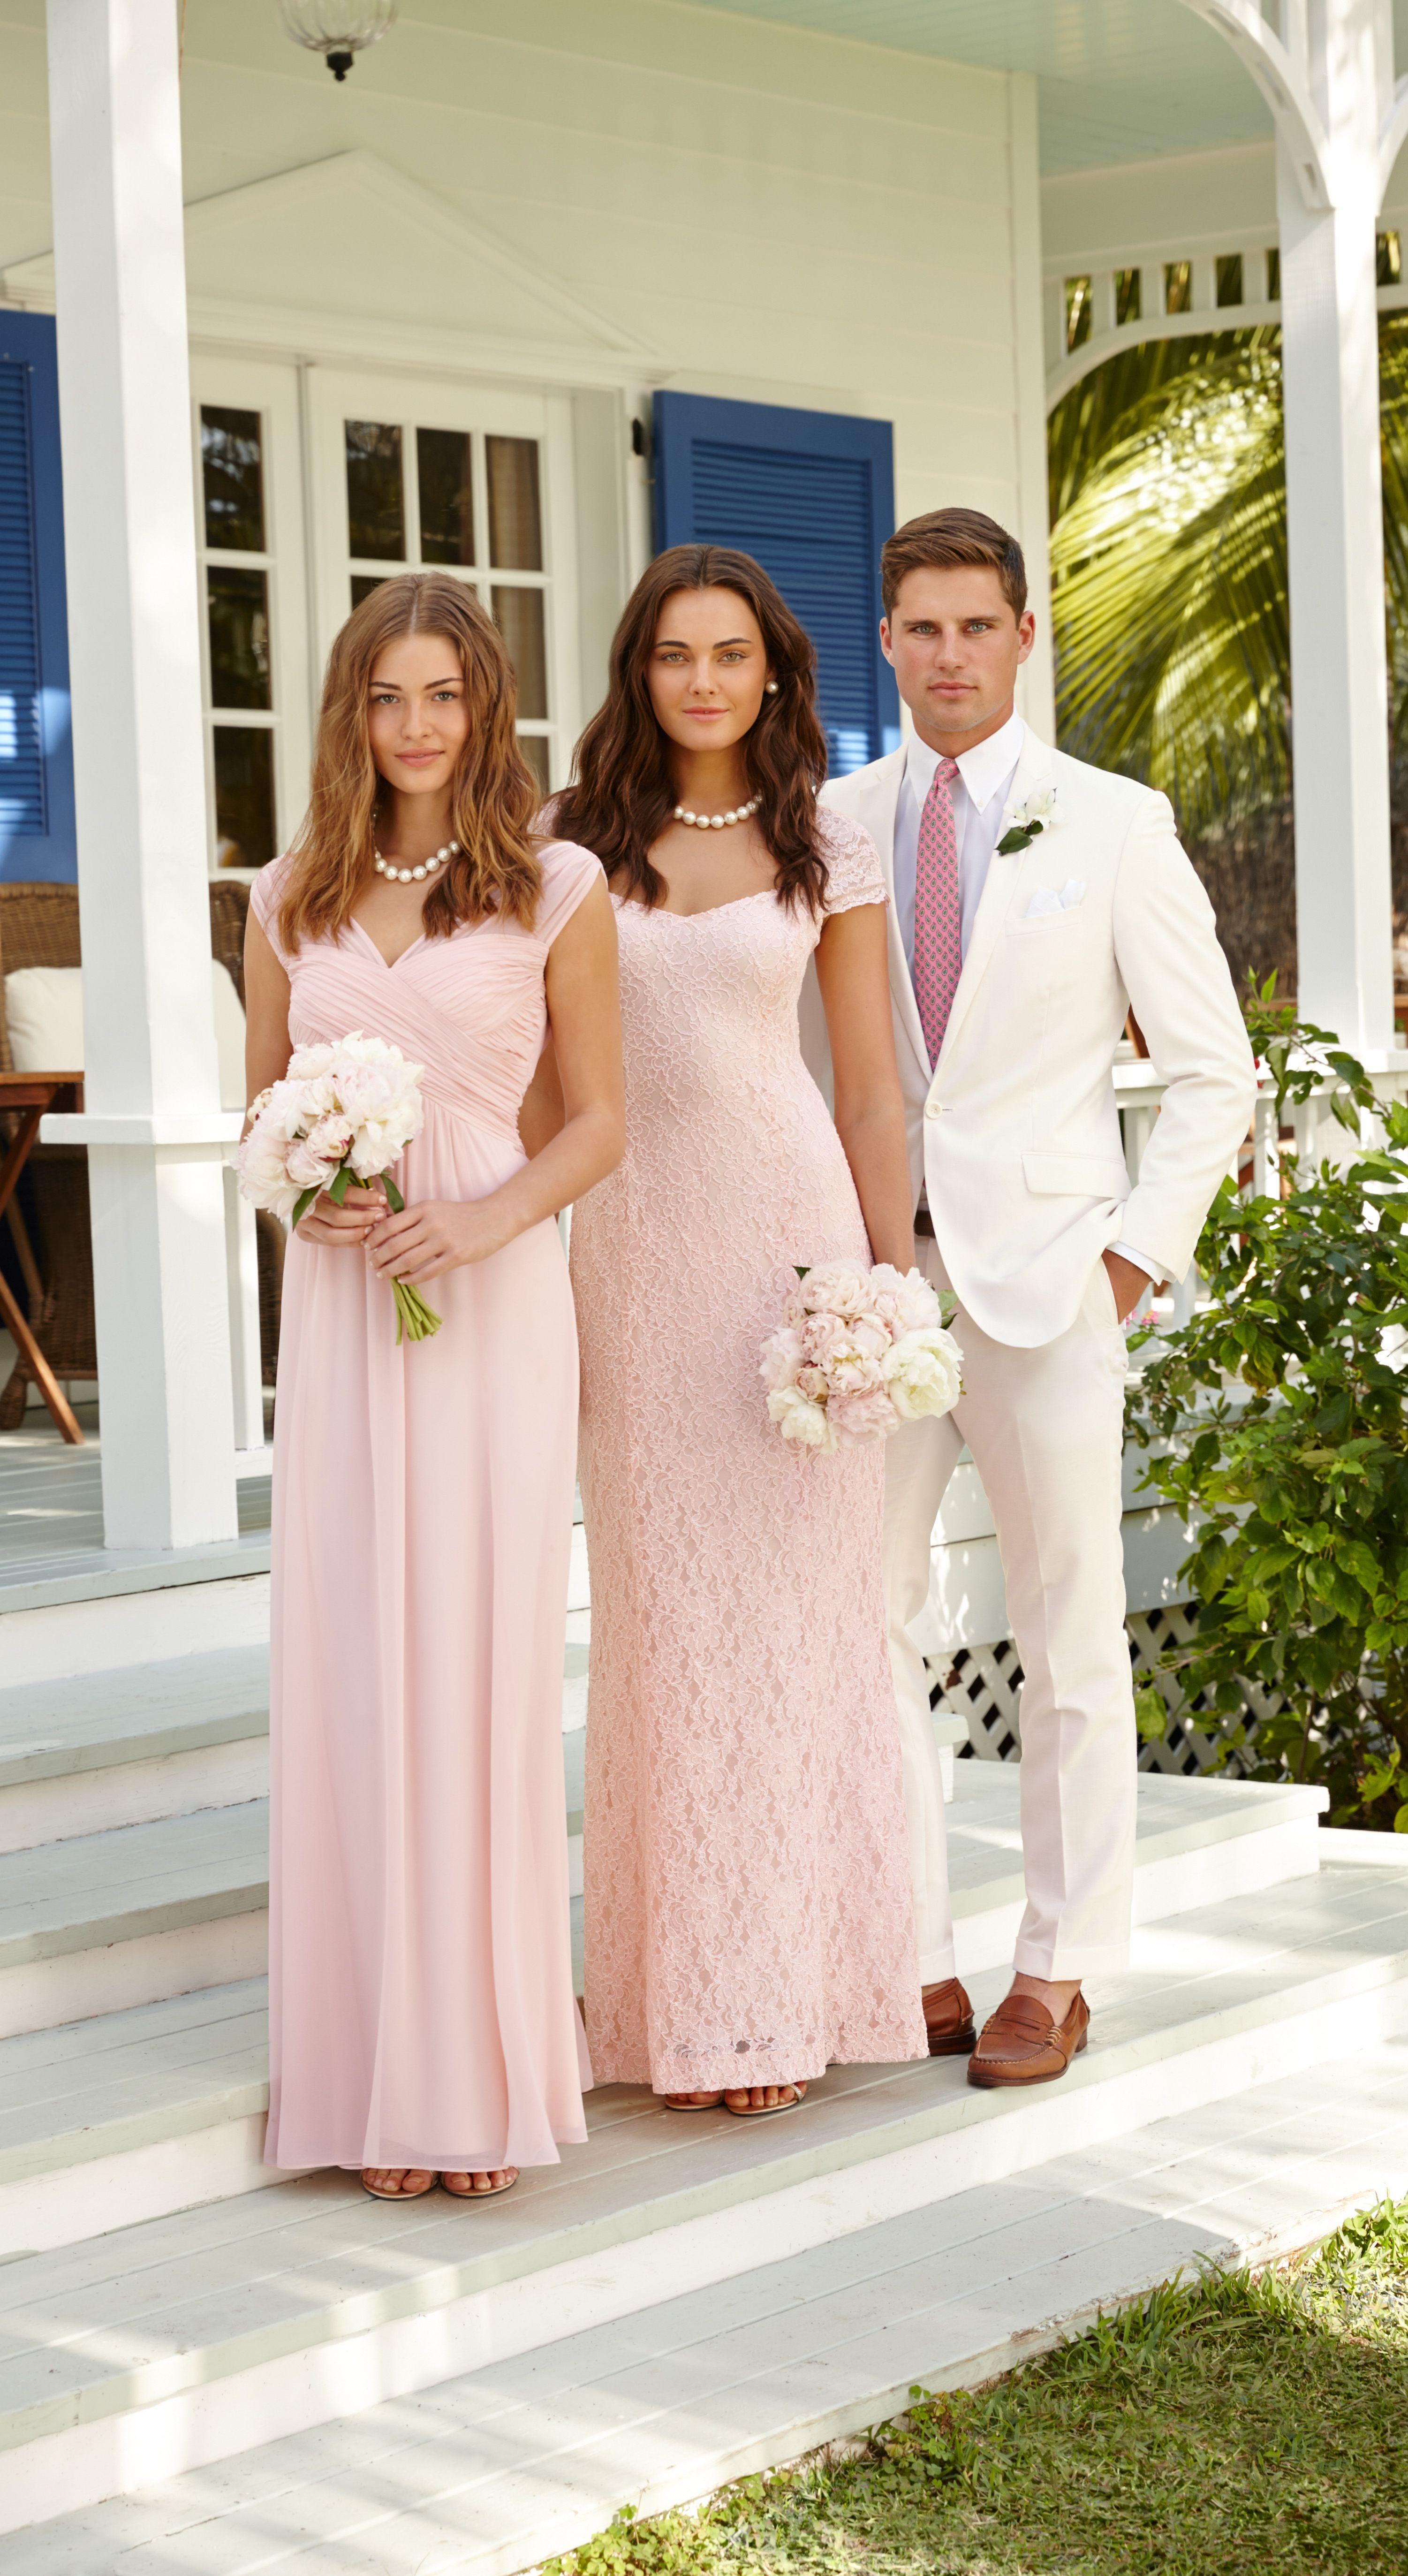 Lauren Ralph Wedding Soft Pink Bridesmaid Dresses And Sharp White Suits Look Elegant